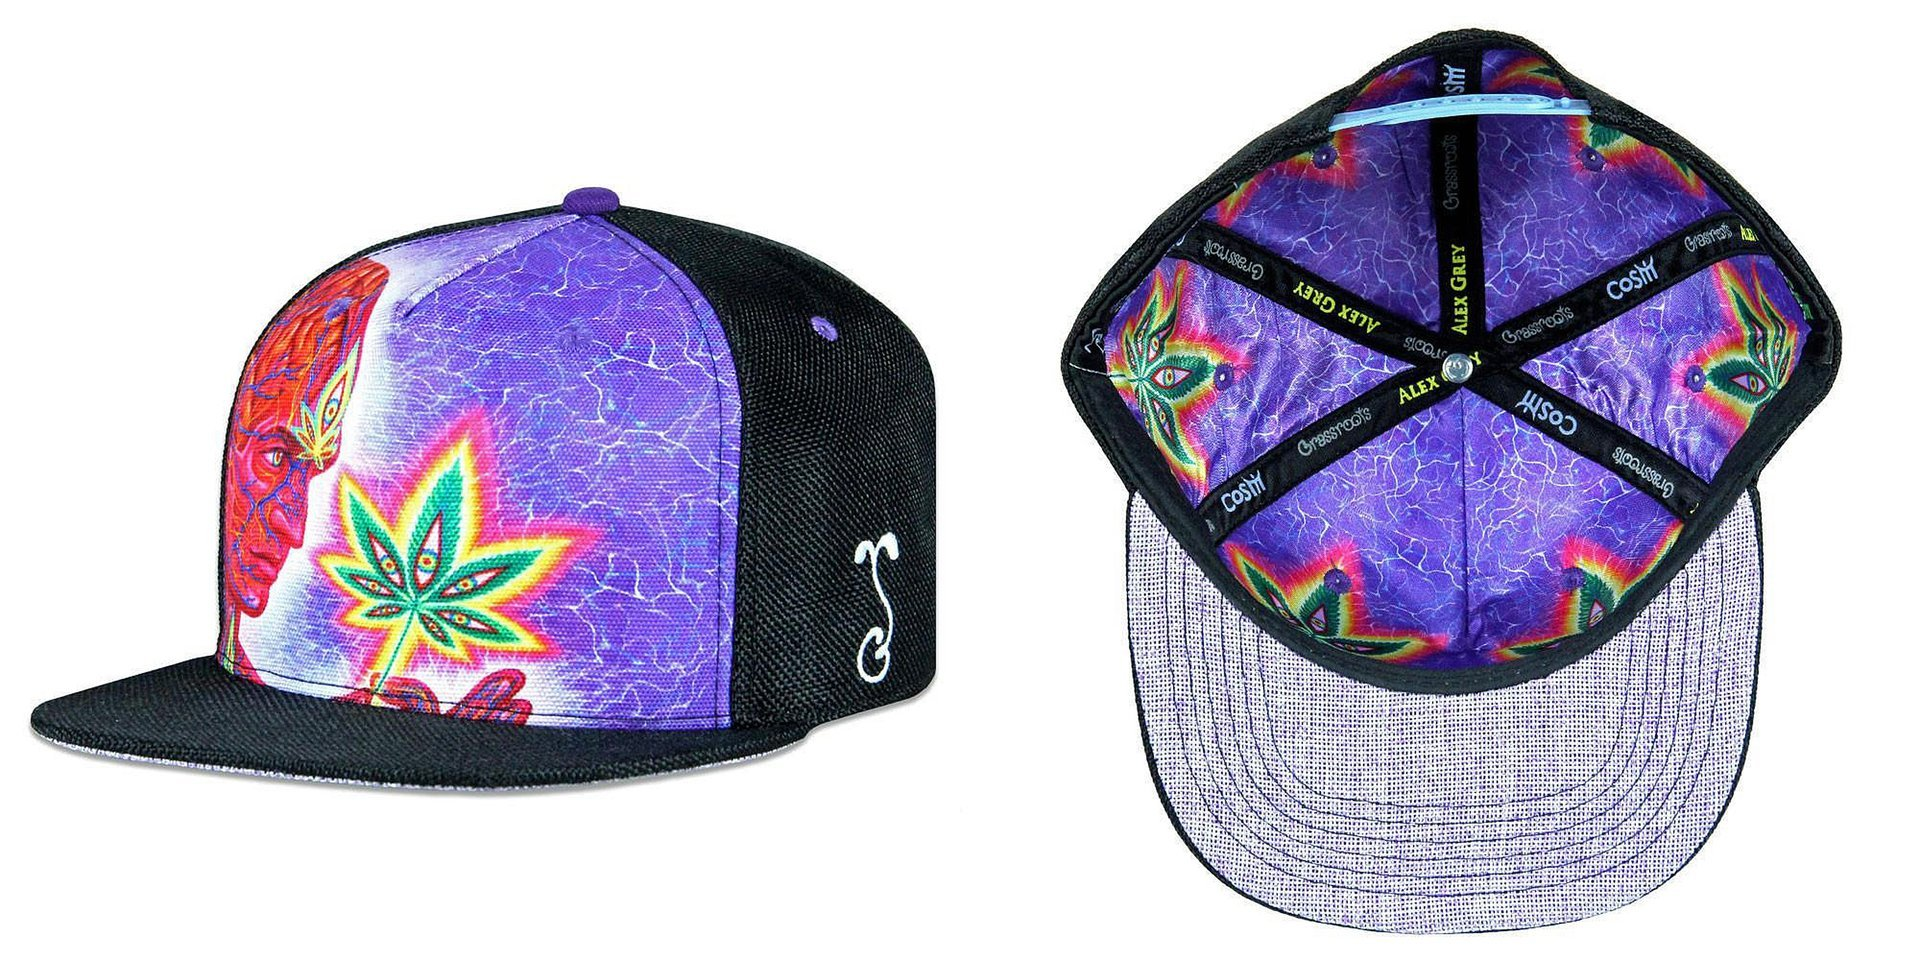 Alex Grey Cannabis Sutra Black Snapback Grassroots California Hat